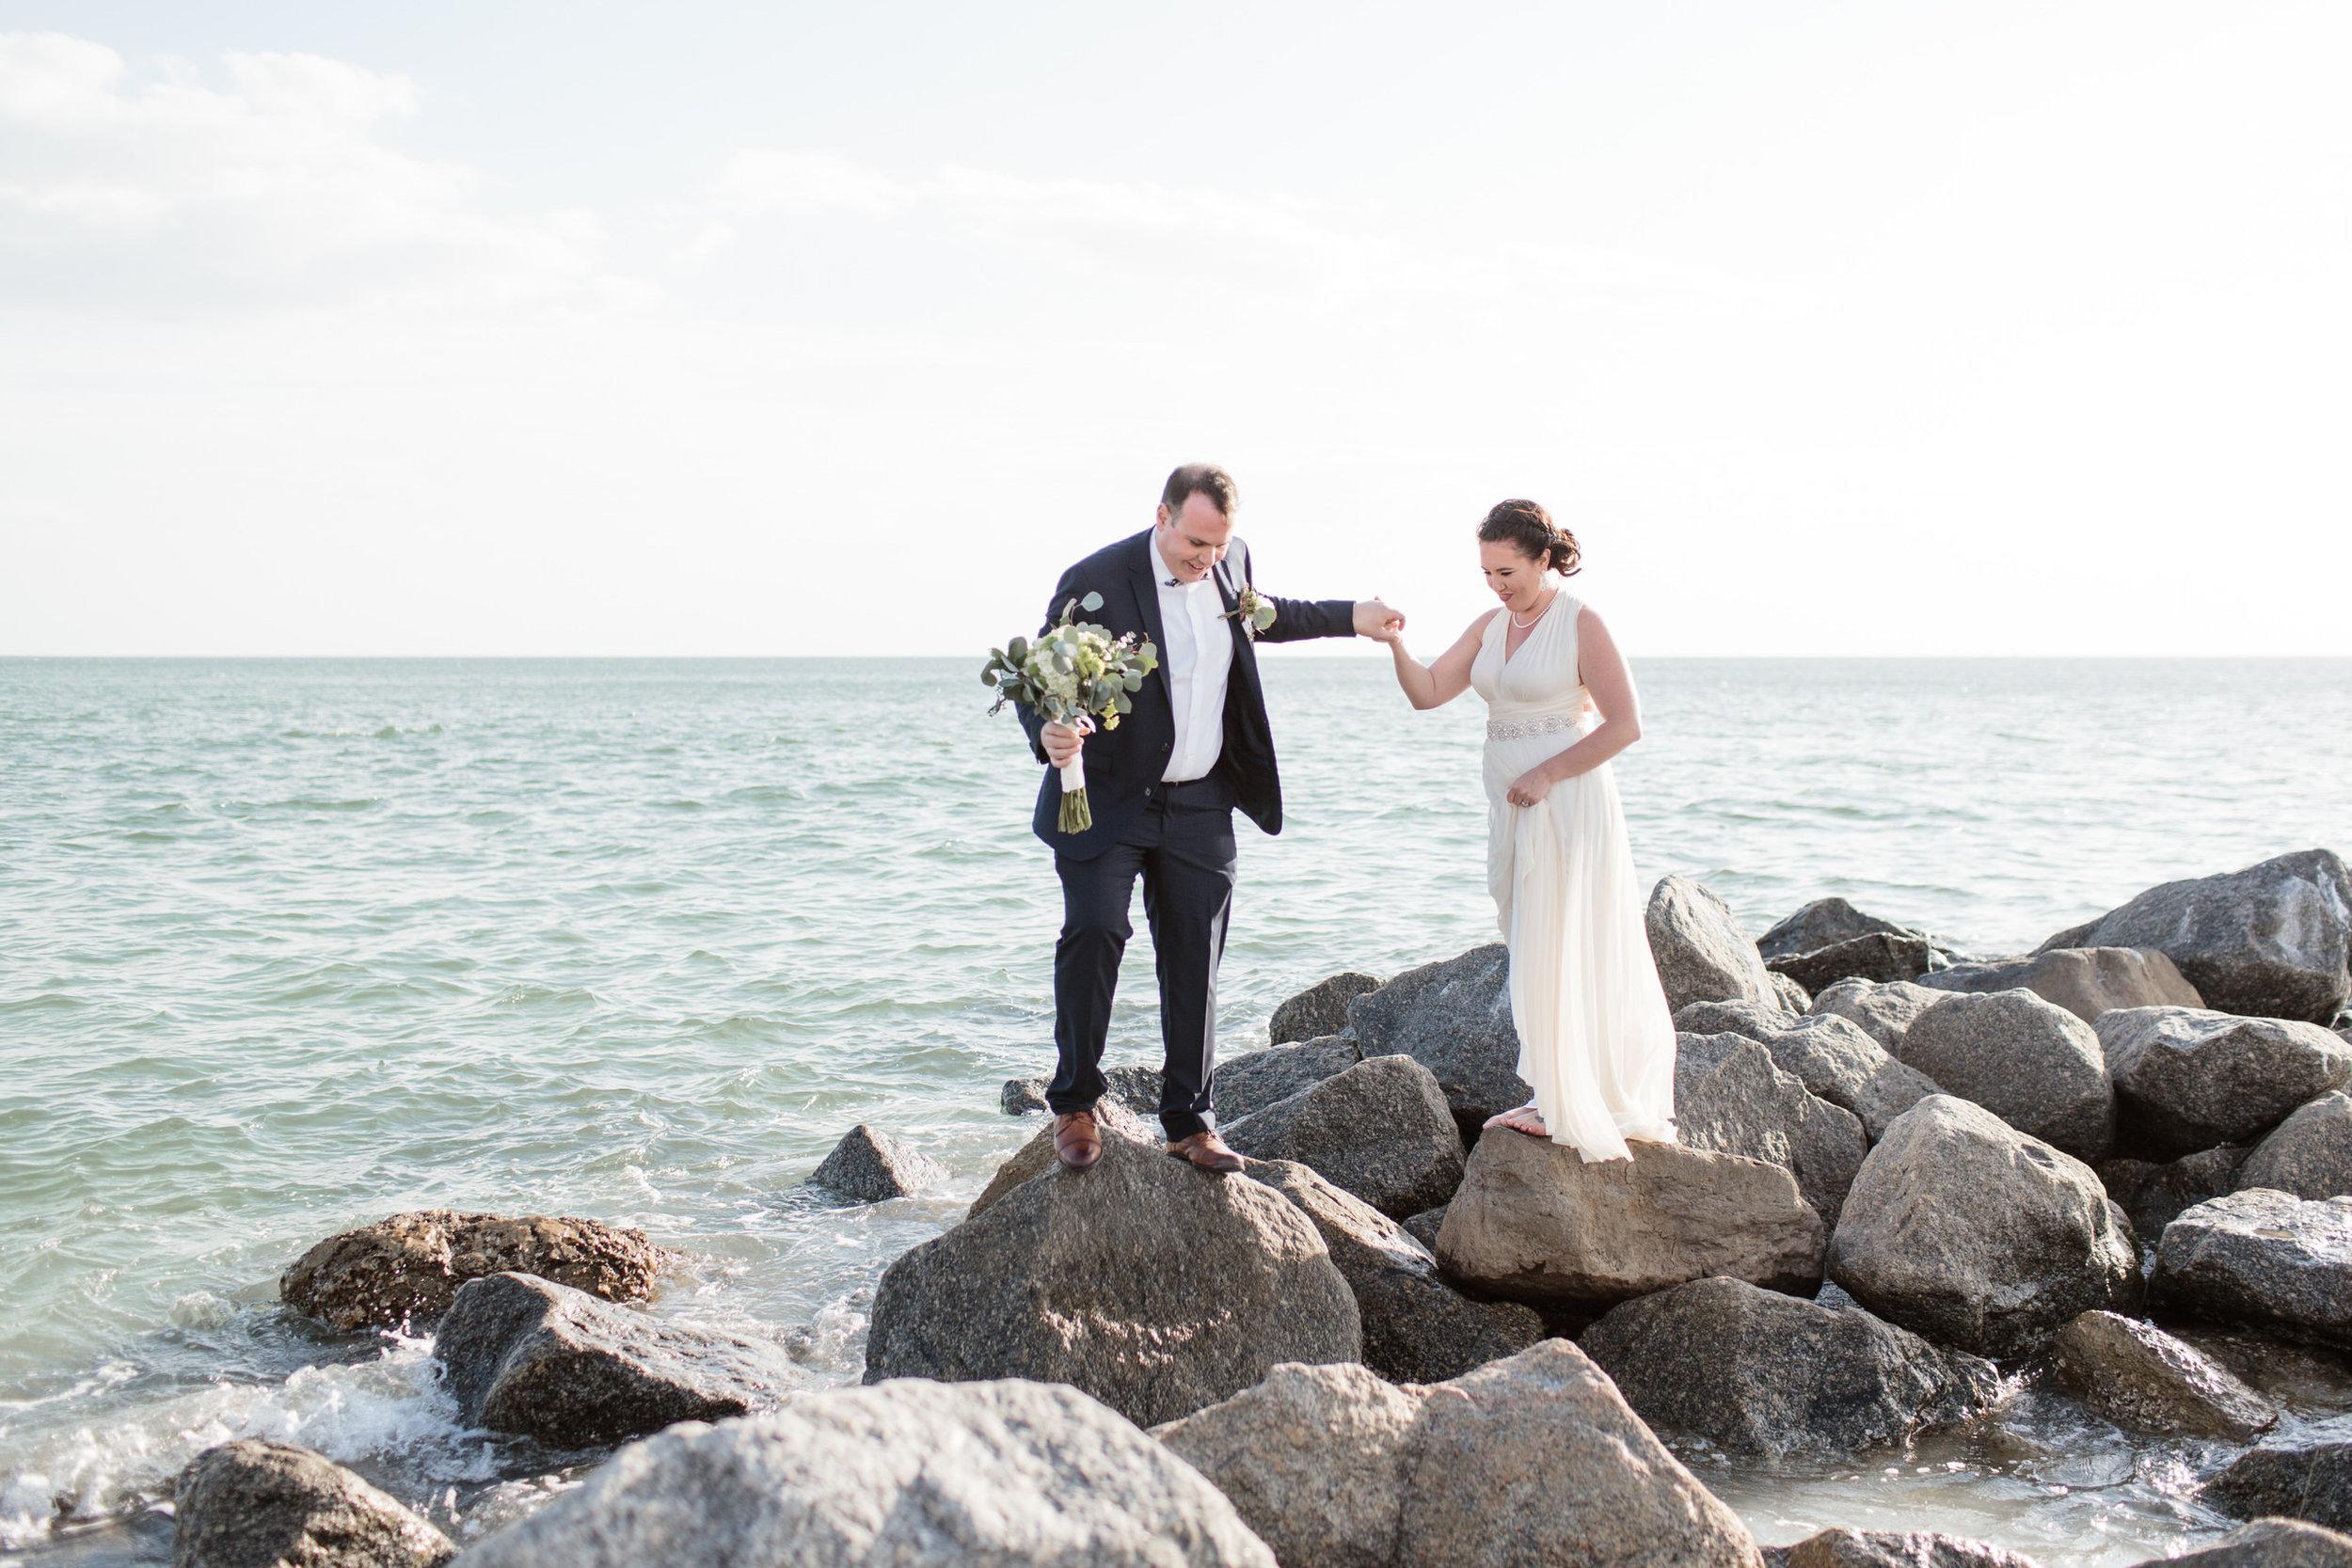 Beltran_Treasure_Island_Elopement_Tampa_Wedding_046-1.jpg